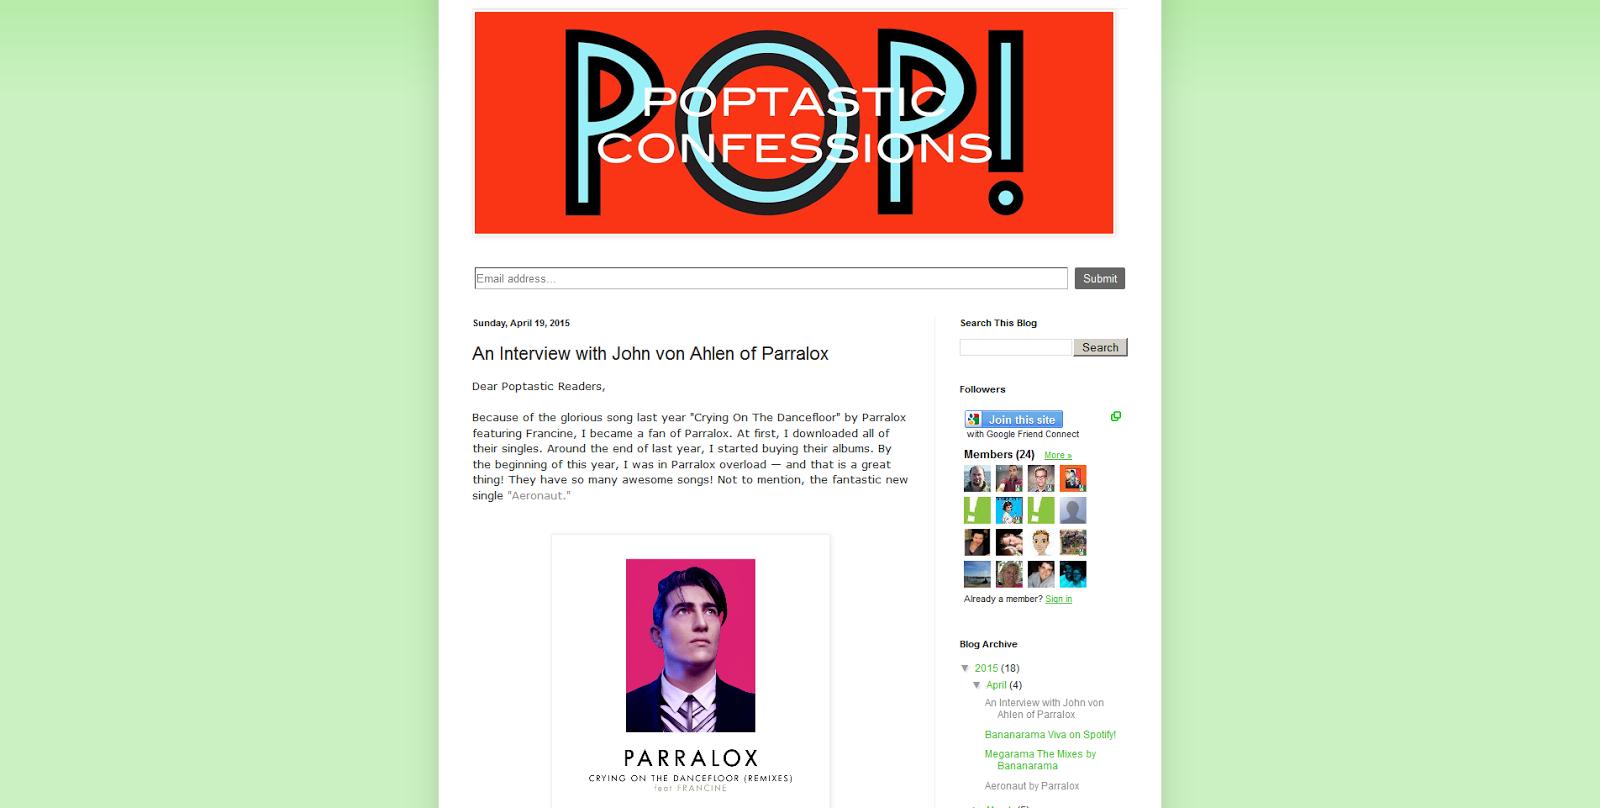 Poptastic Confessions (USA) interviews John von Ahlen of Parralox